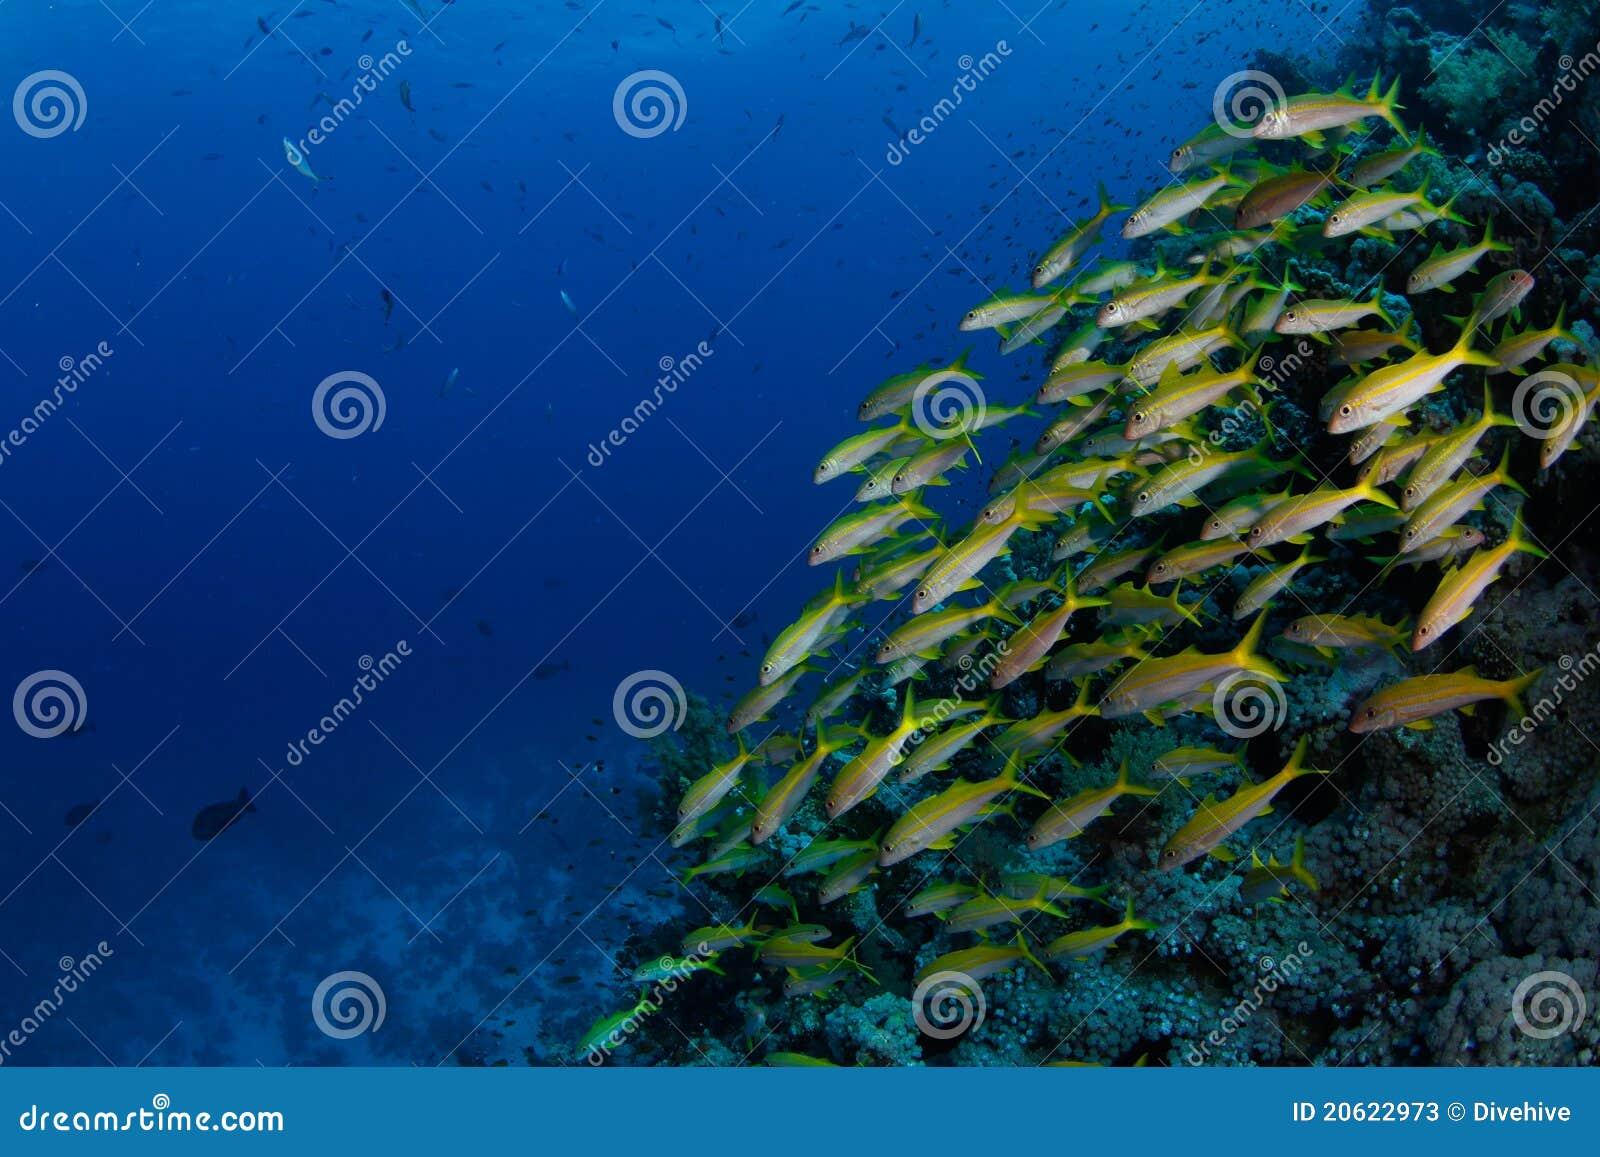 School of goatfish